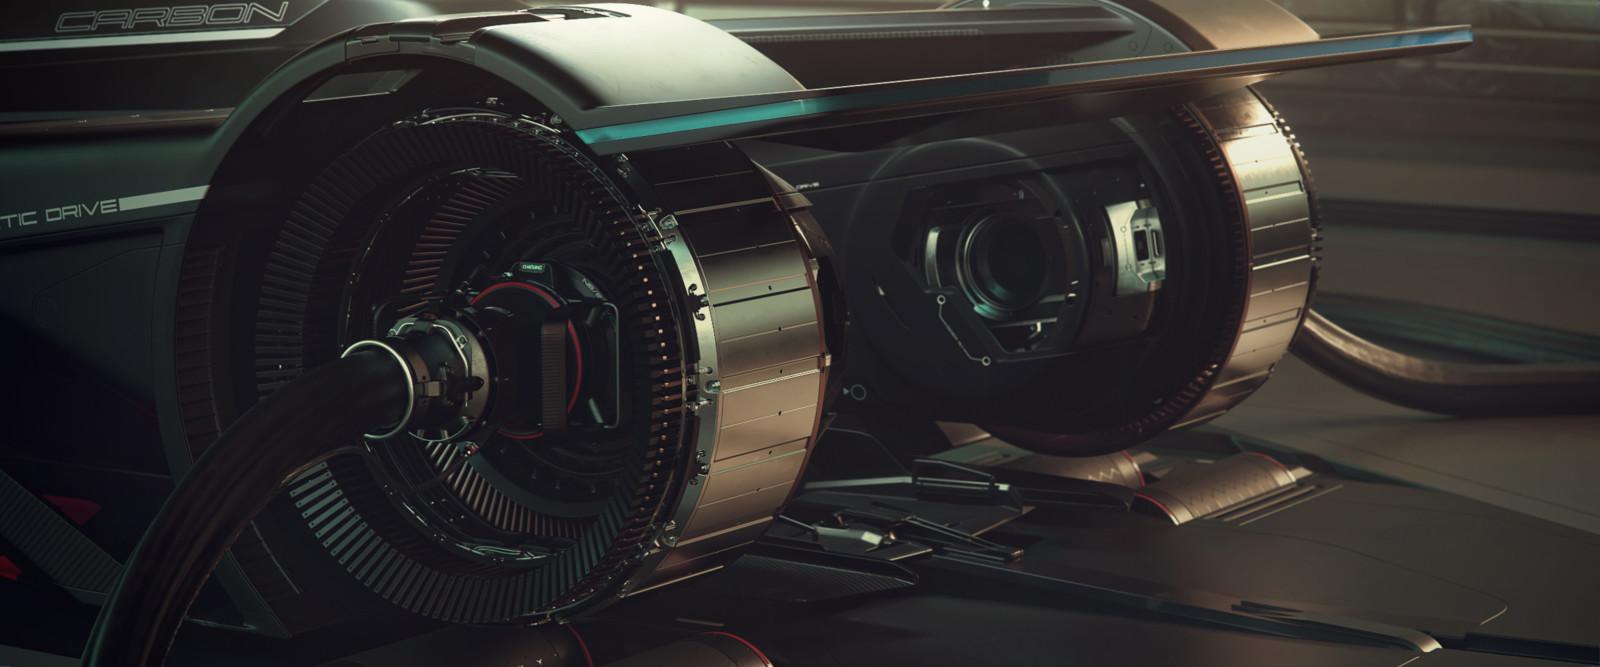 Charging up / Rear jack integrated into diagnostics platform.